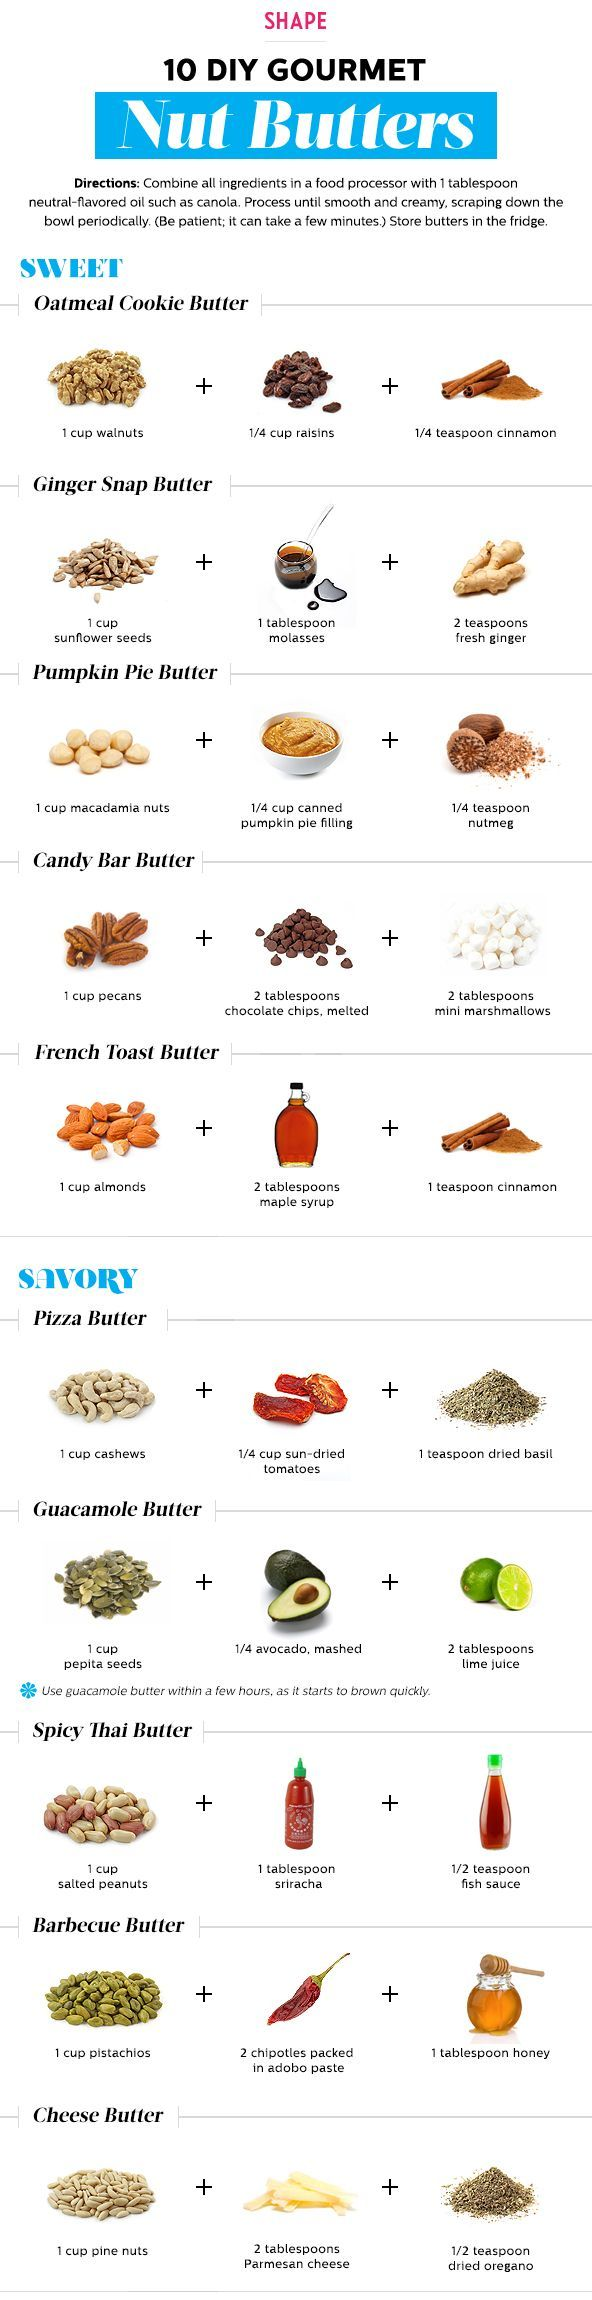 Gourmet Nut Butter Recipes - Shape Magazine